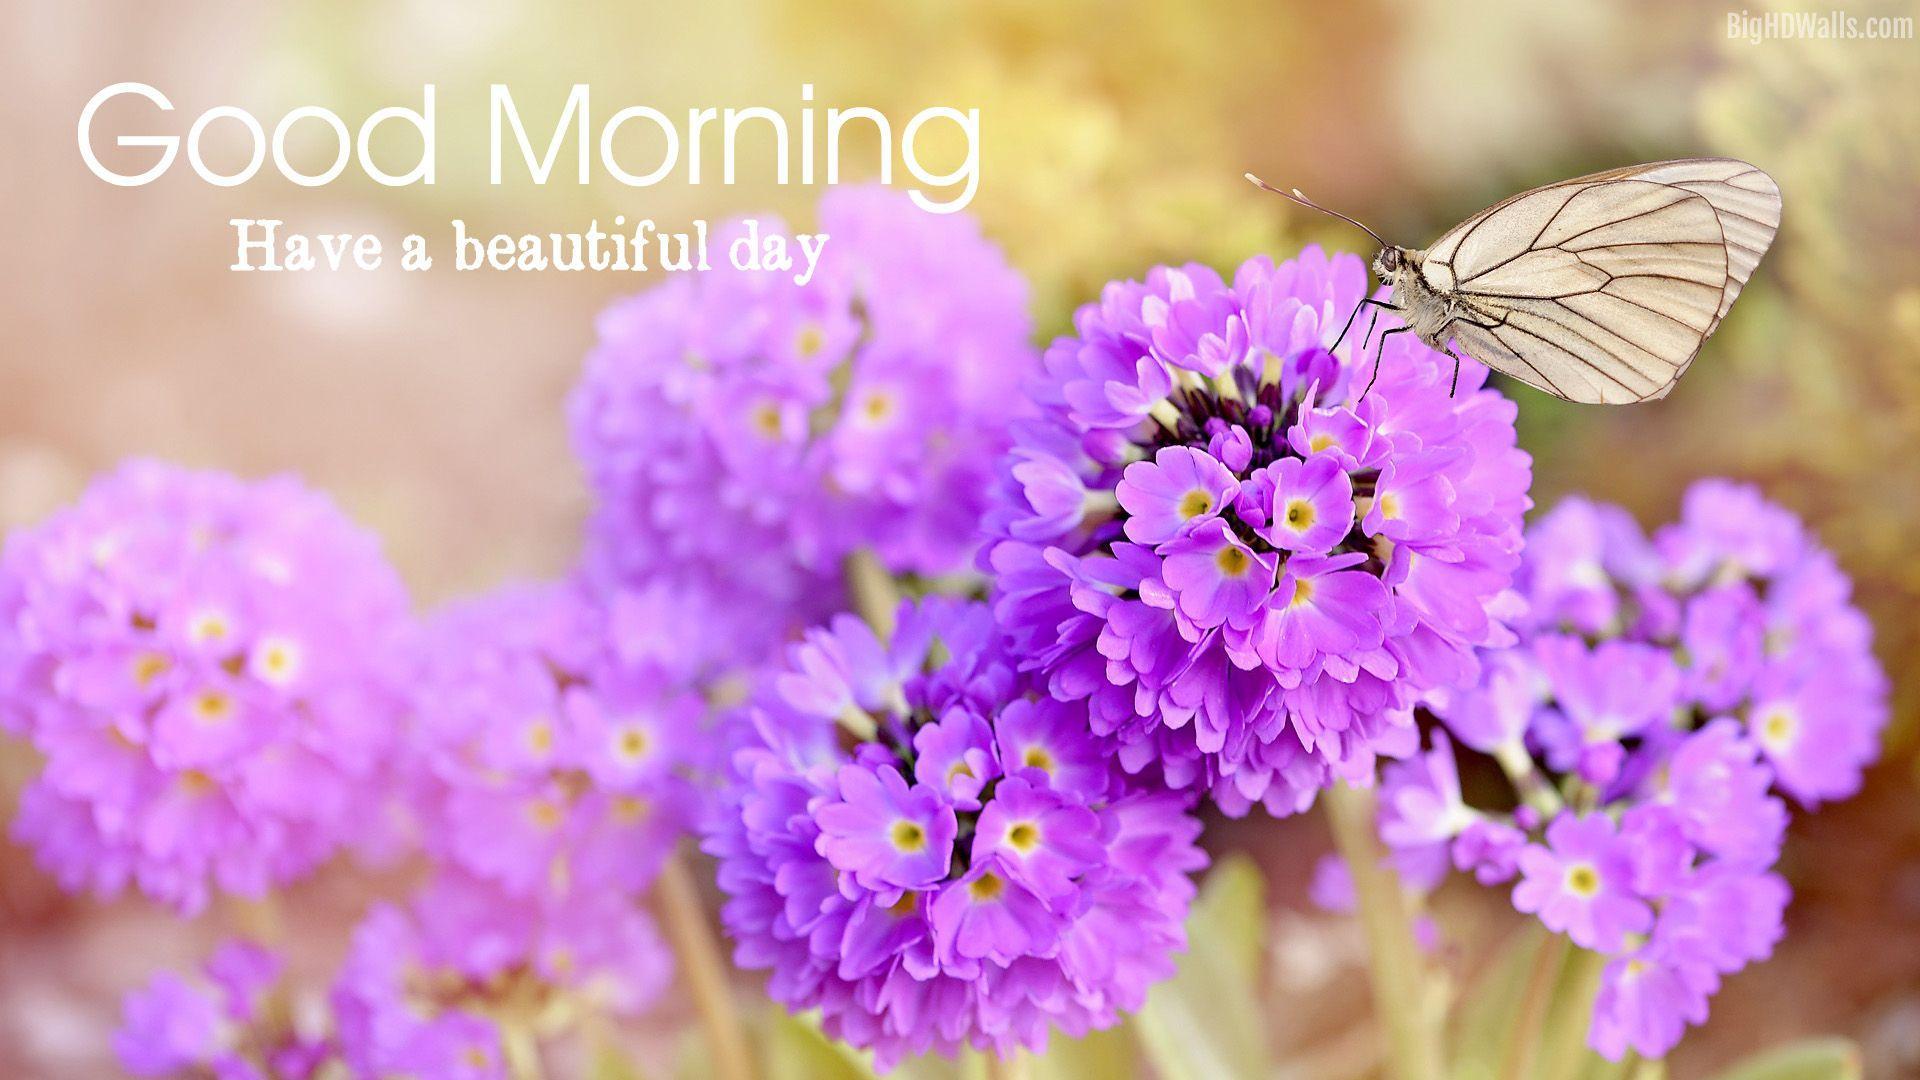 1920x1080 Beautiful Morning Flowers HD Wallpaper For Download - Good Morning Flowers HD, Tải xuống hình nền